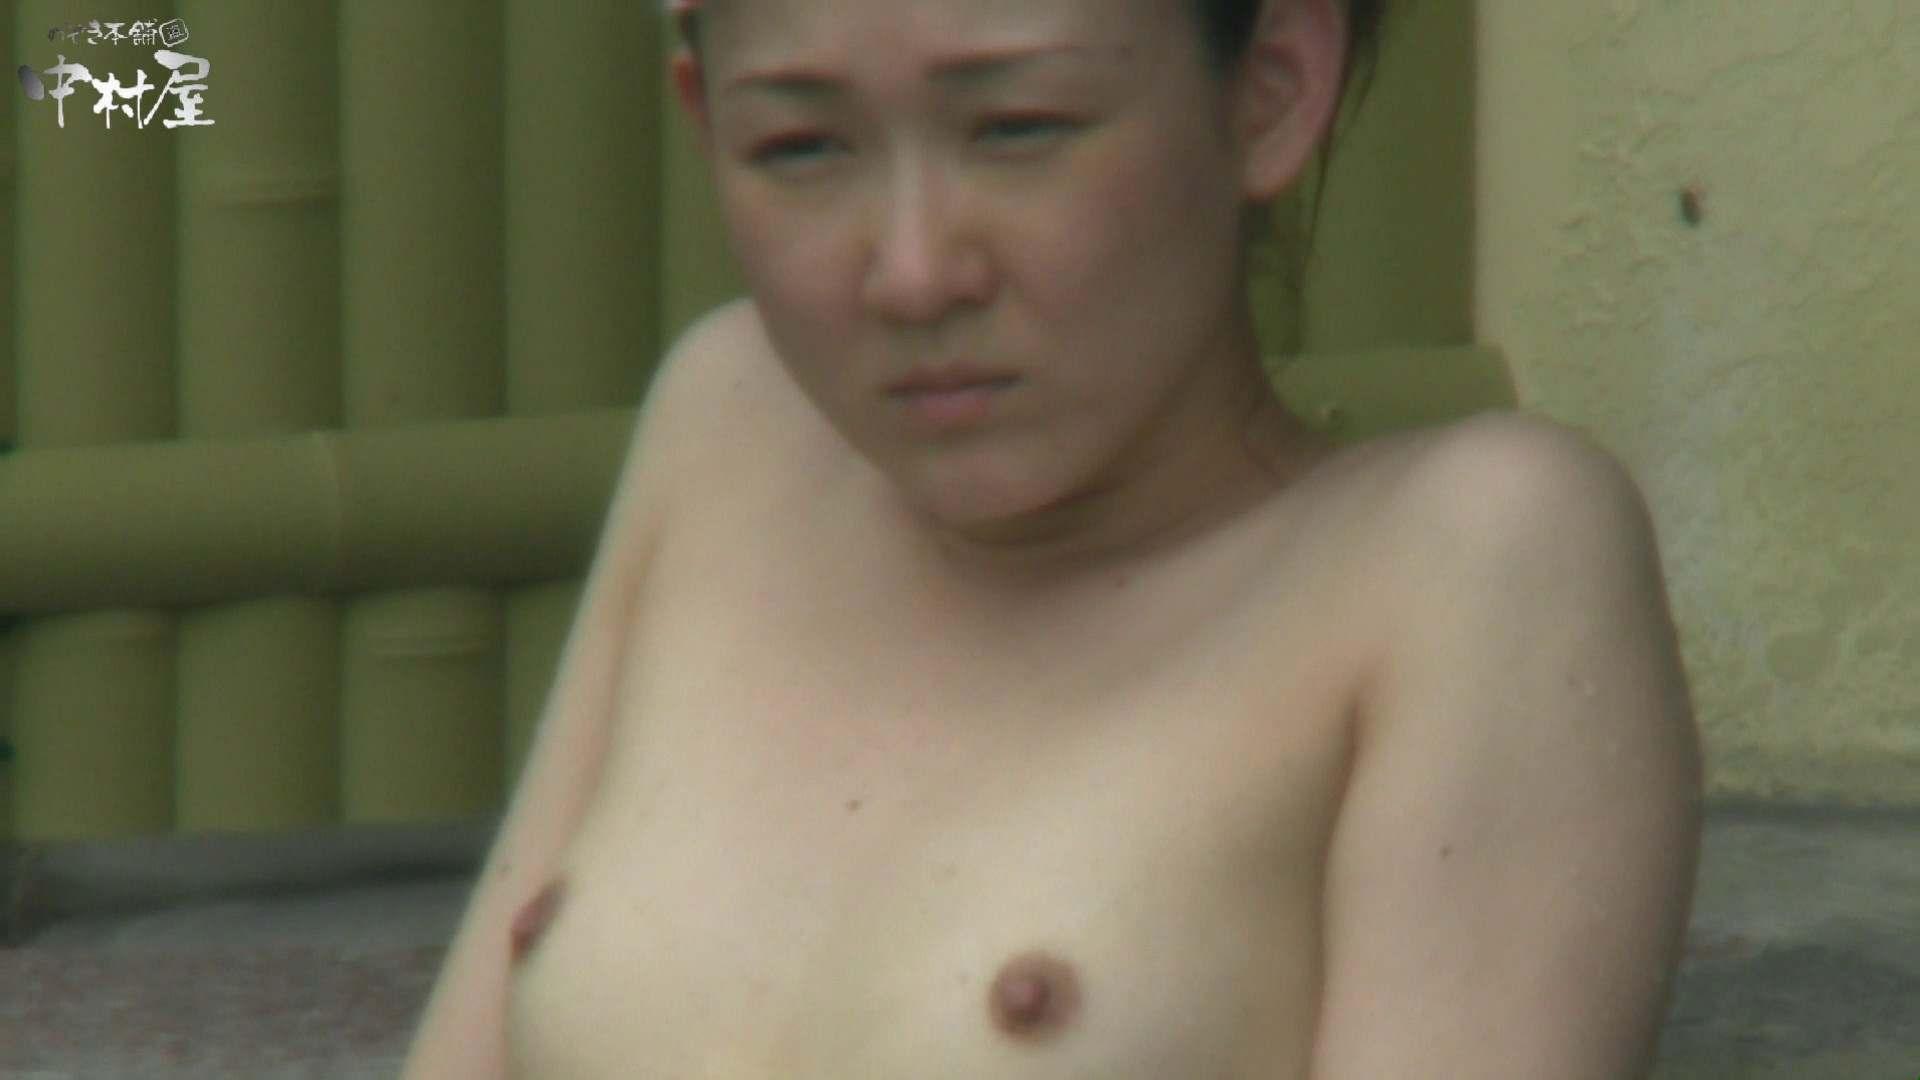 Aquaな露天風呂Vol.943 盗撮  53連発 27